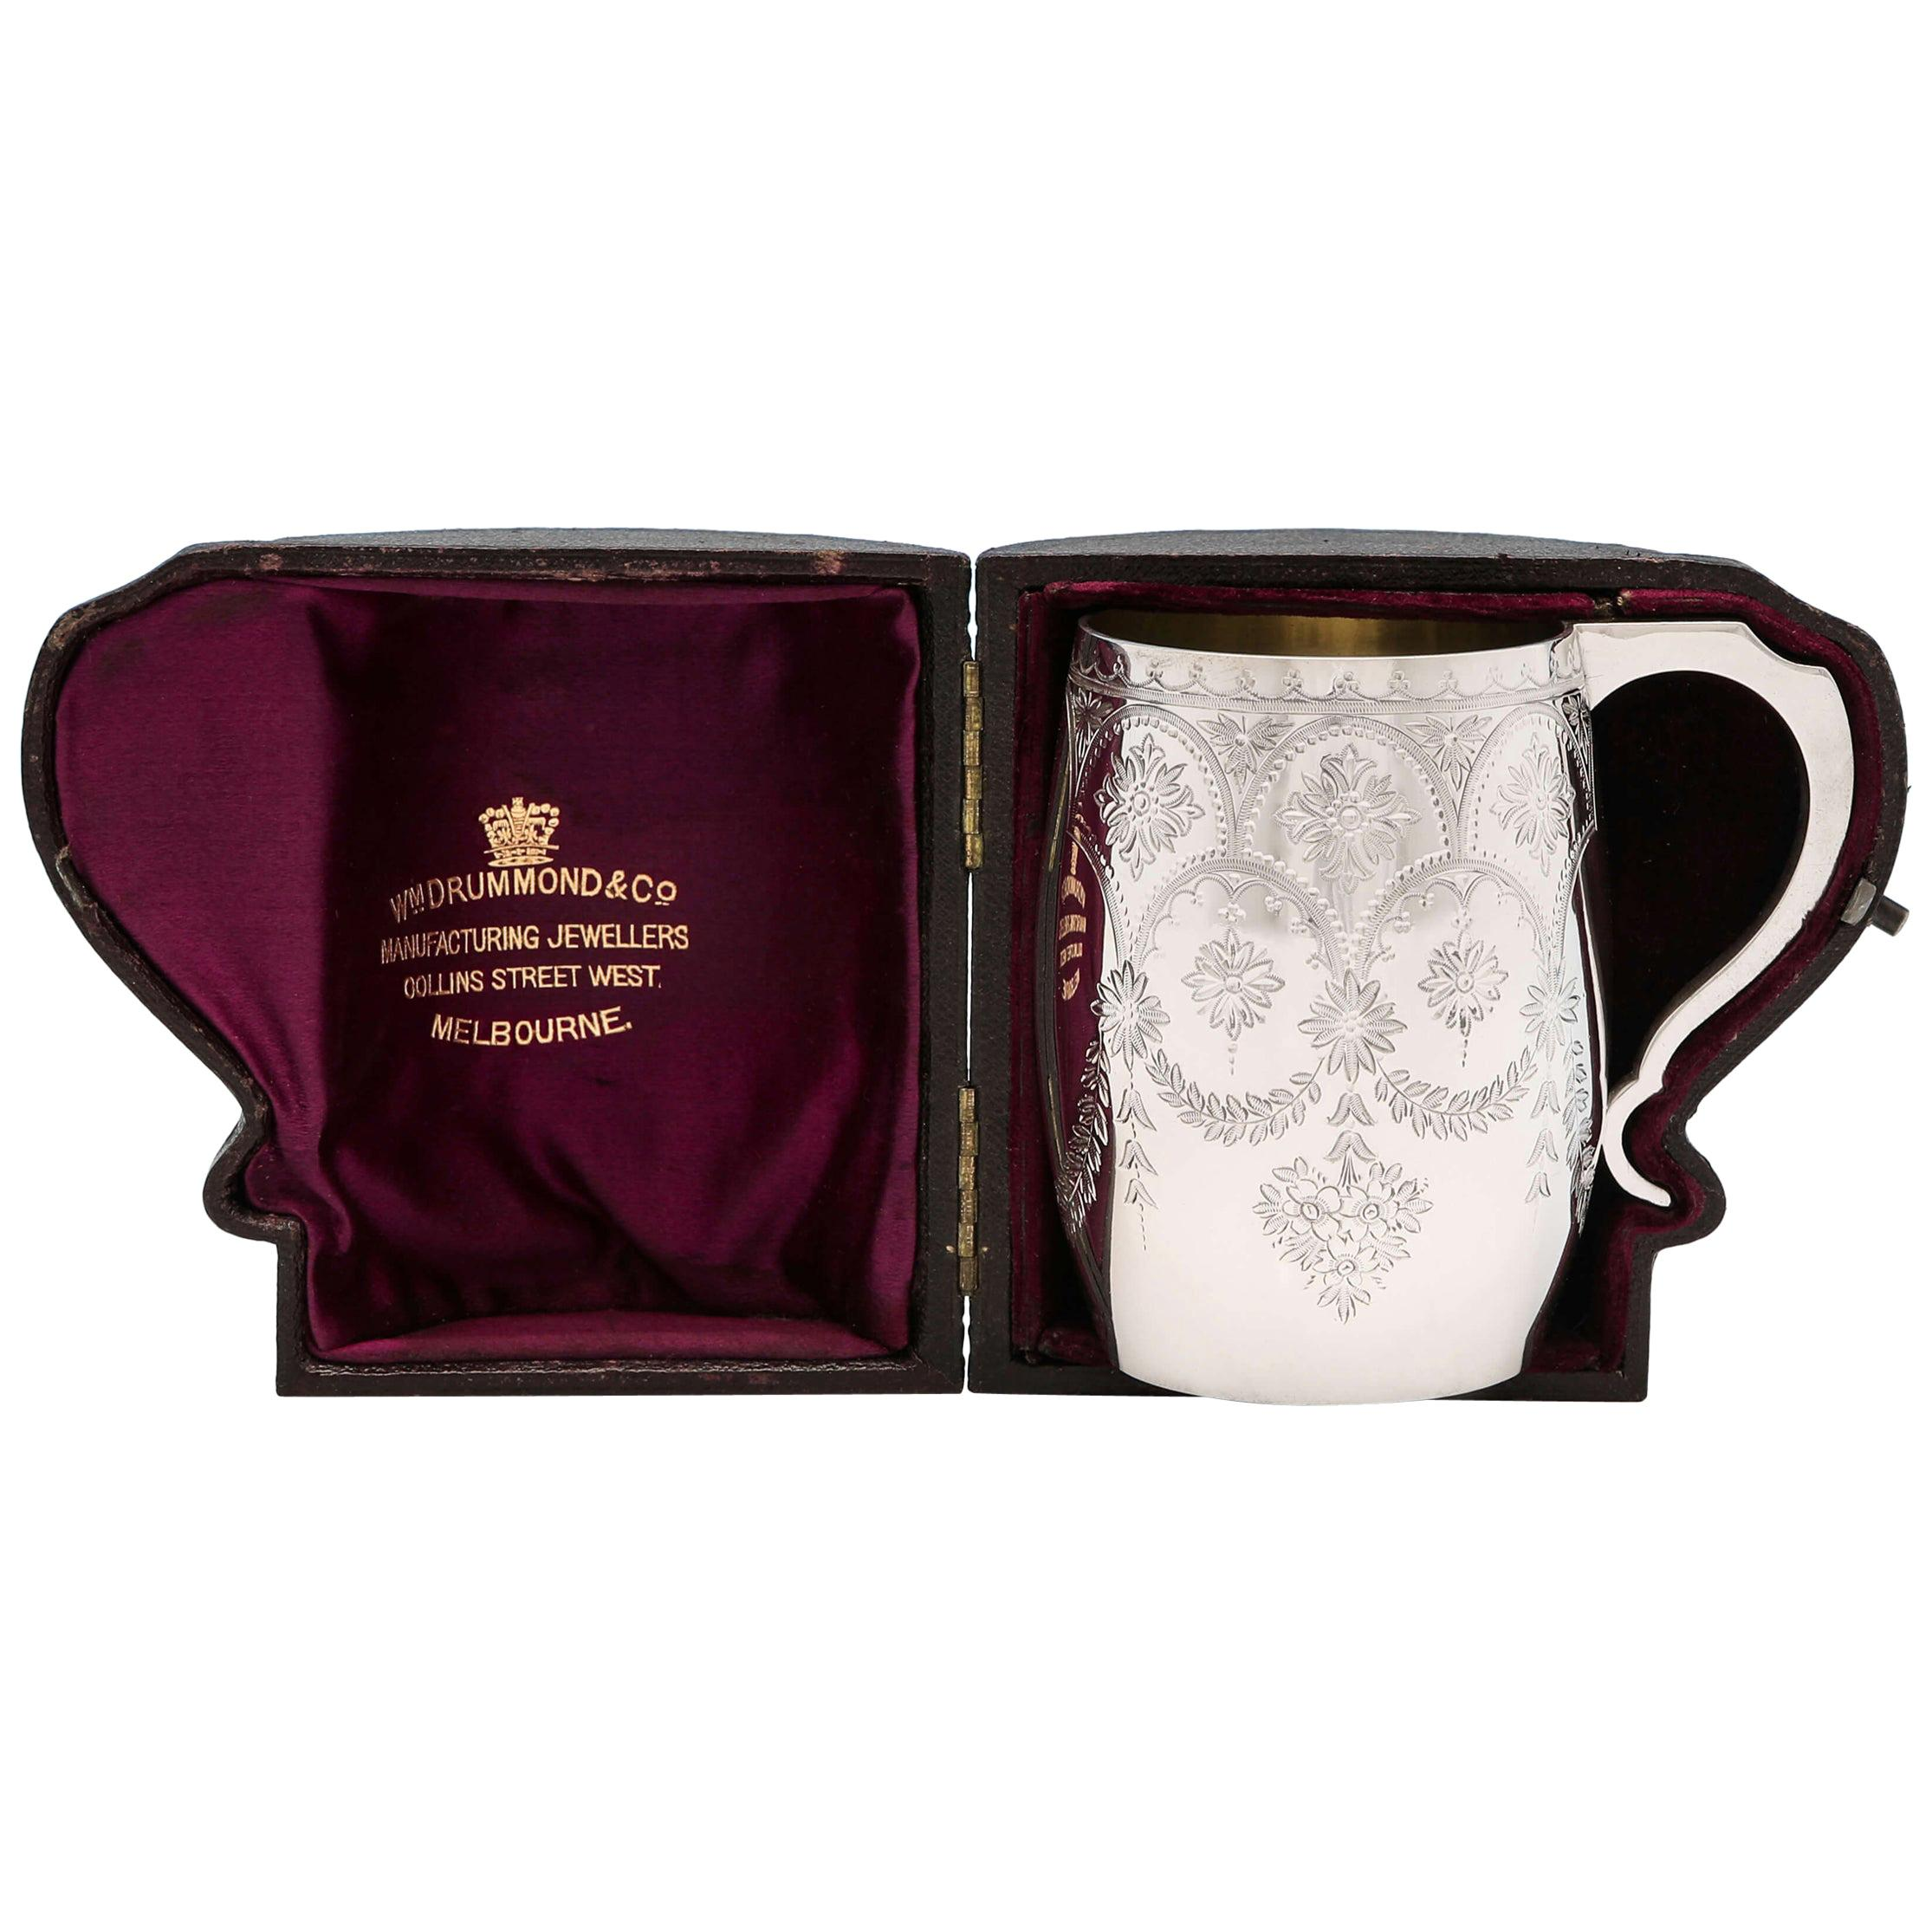 Victorian Sterling Silver Christening Mug by Barnards in Original Box, 1885